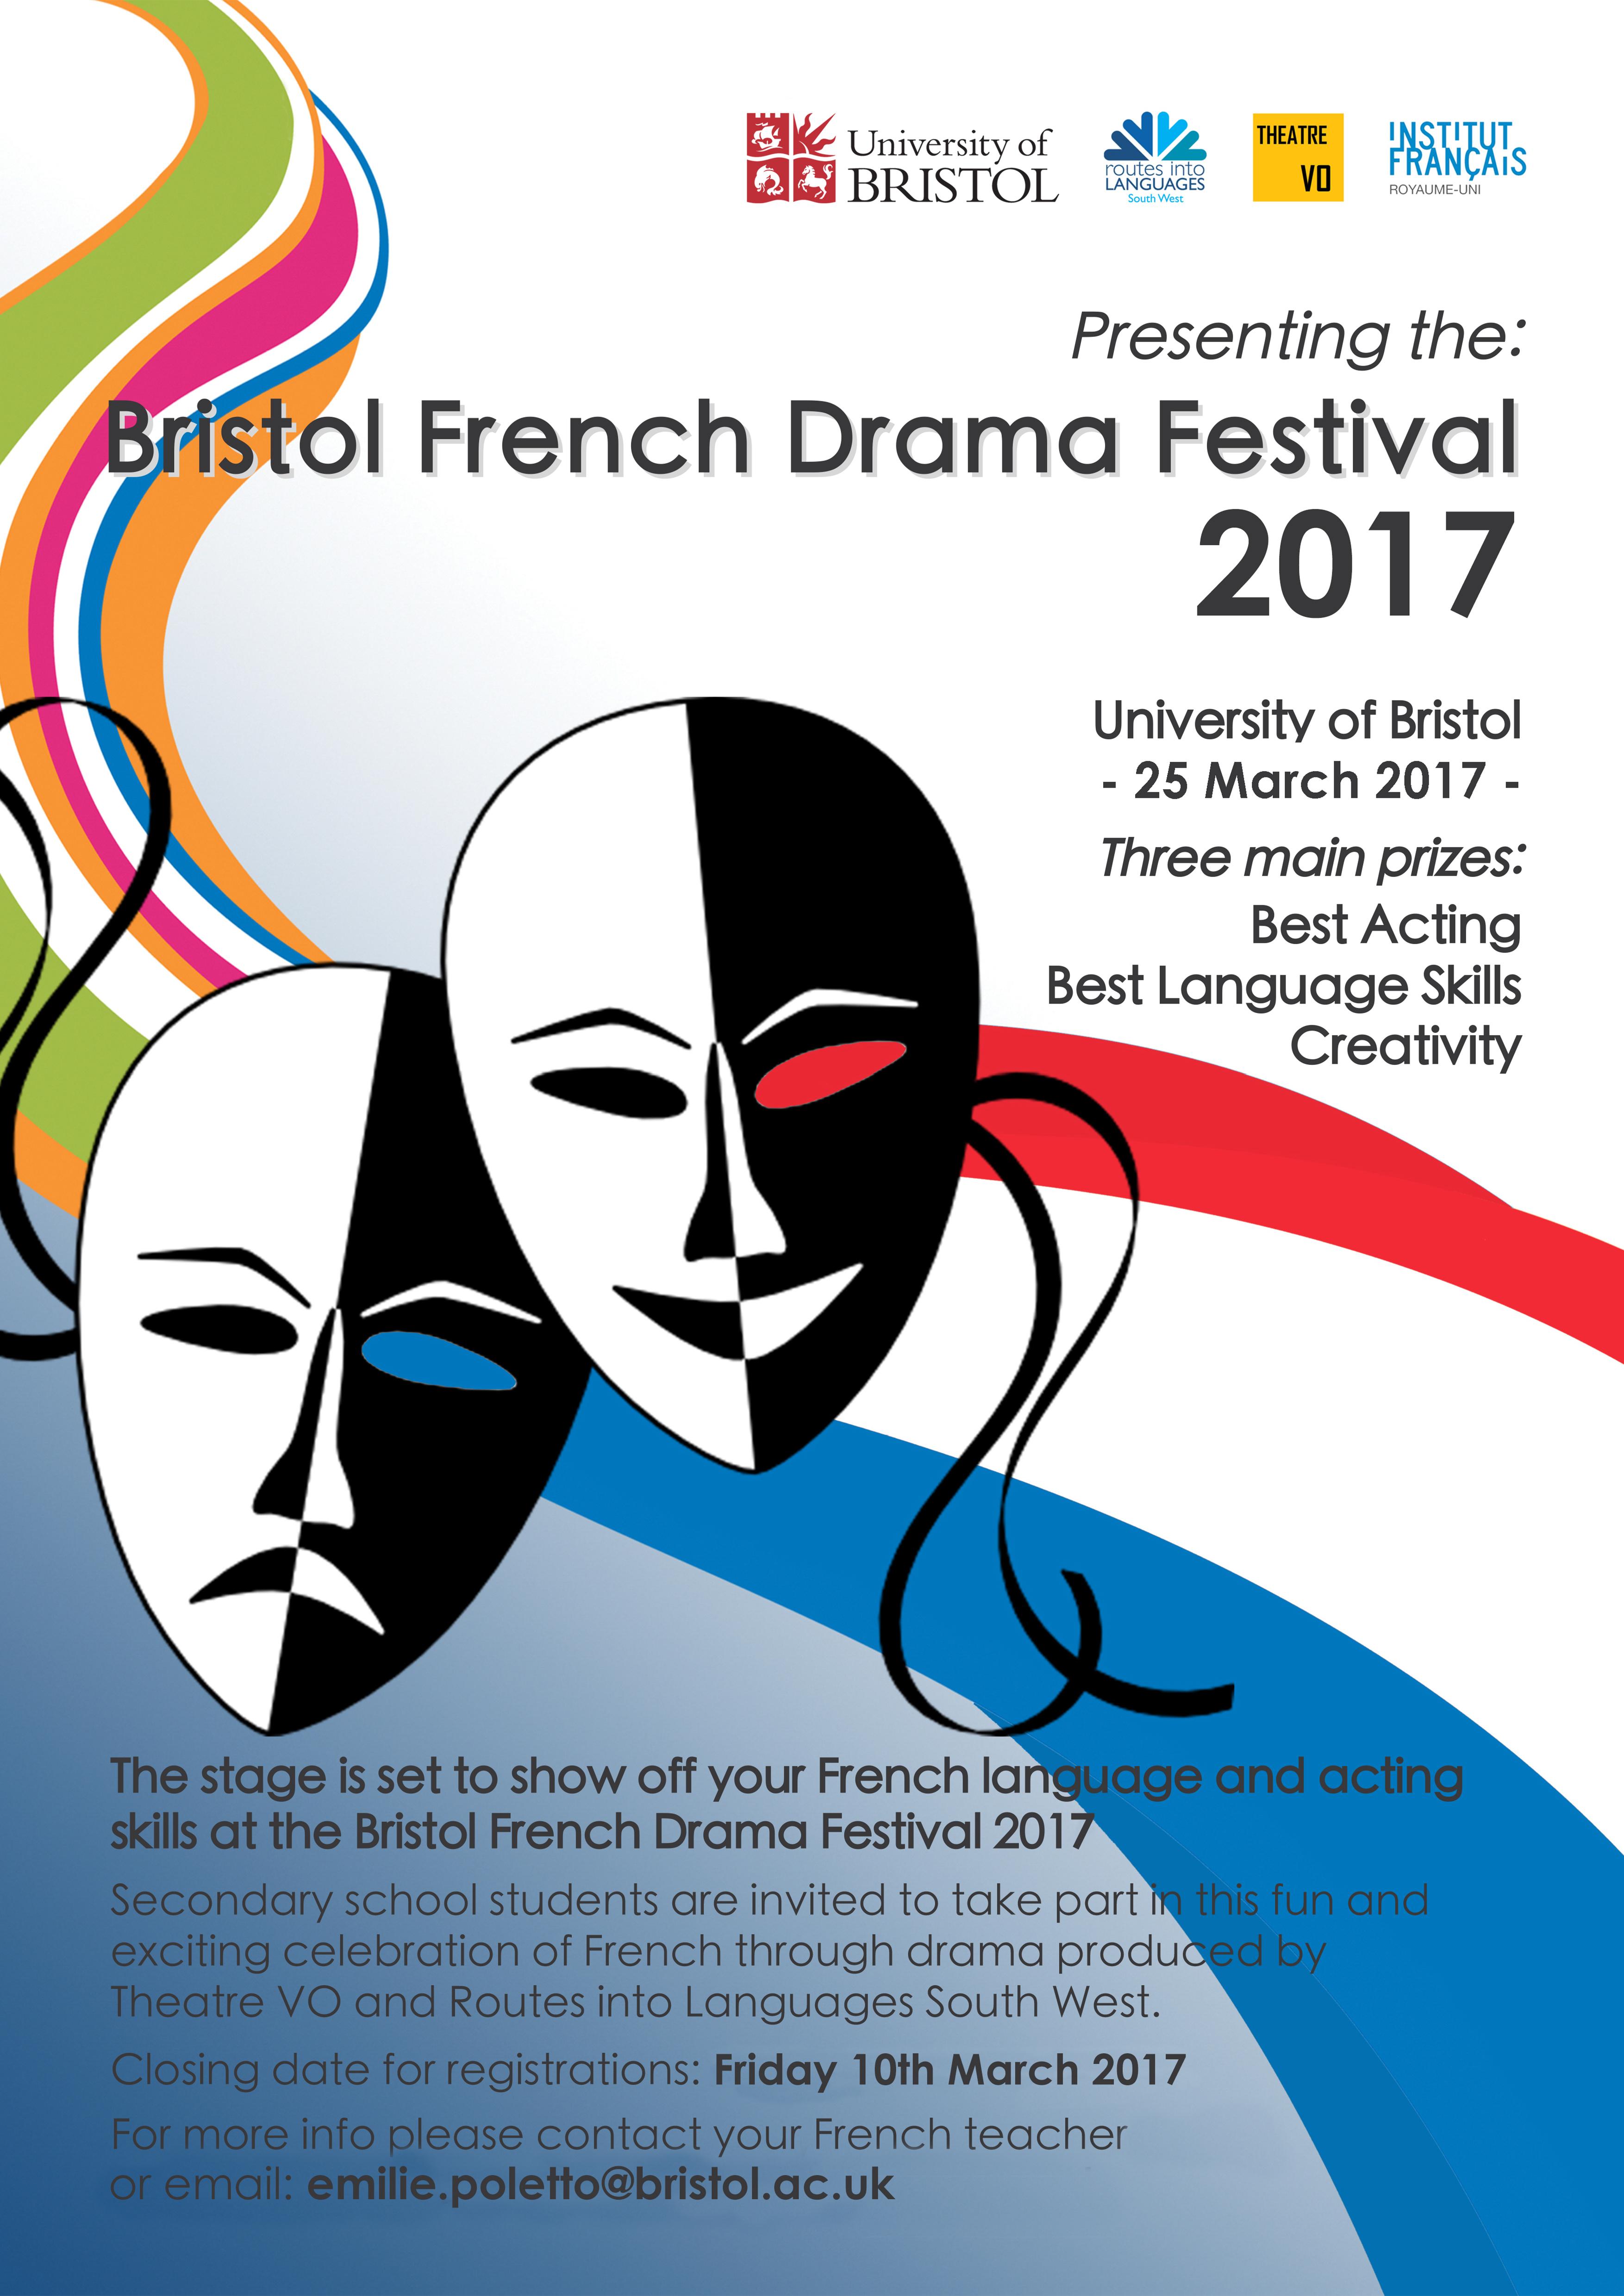 Bristol French Drama Festival Postera3